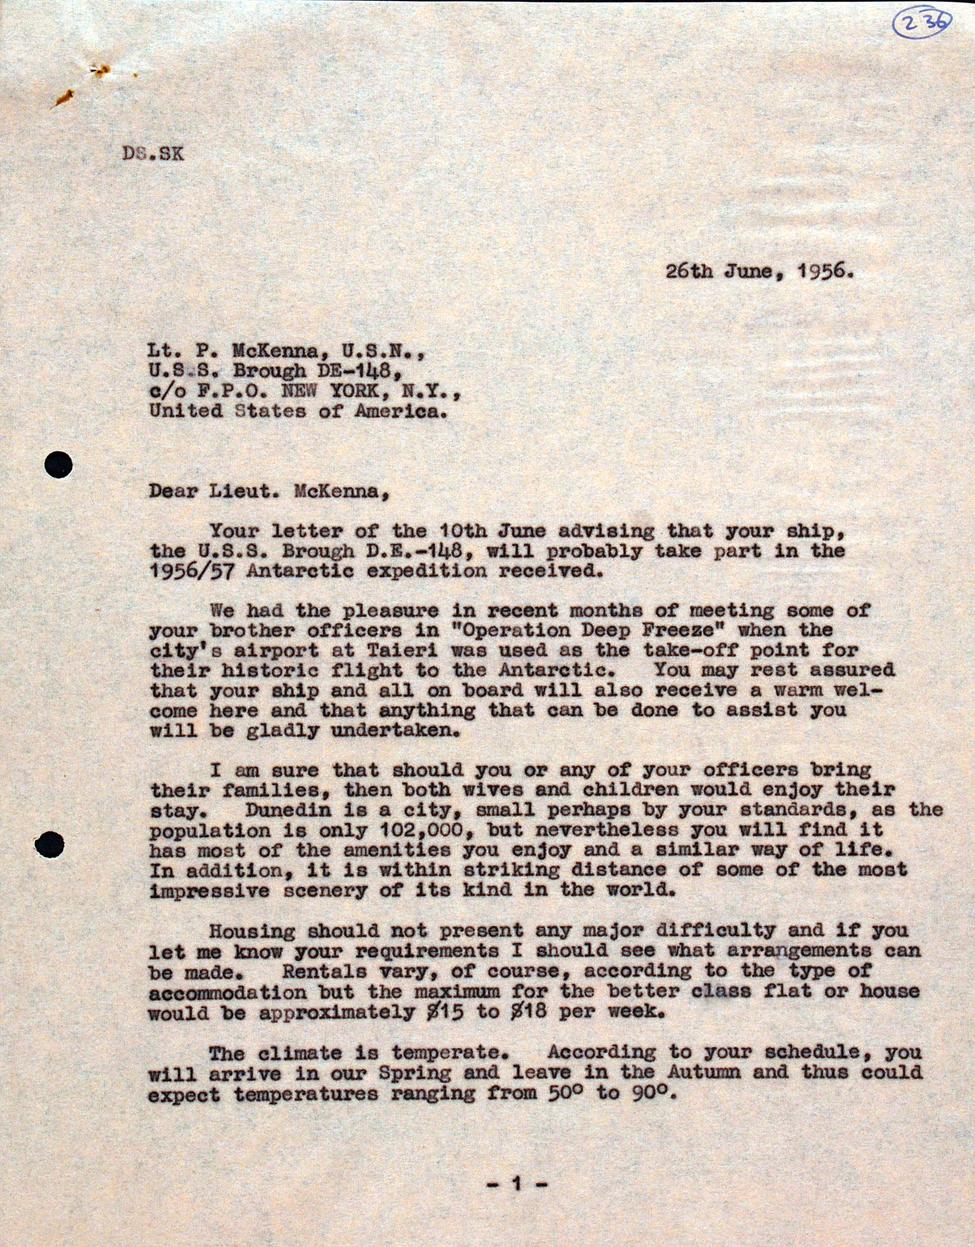 Letter. Mayor [L. M. Wright] to Lt. Patrick McKenna, the Octagon, Dunedin, 26 June 1956.